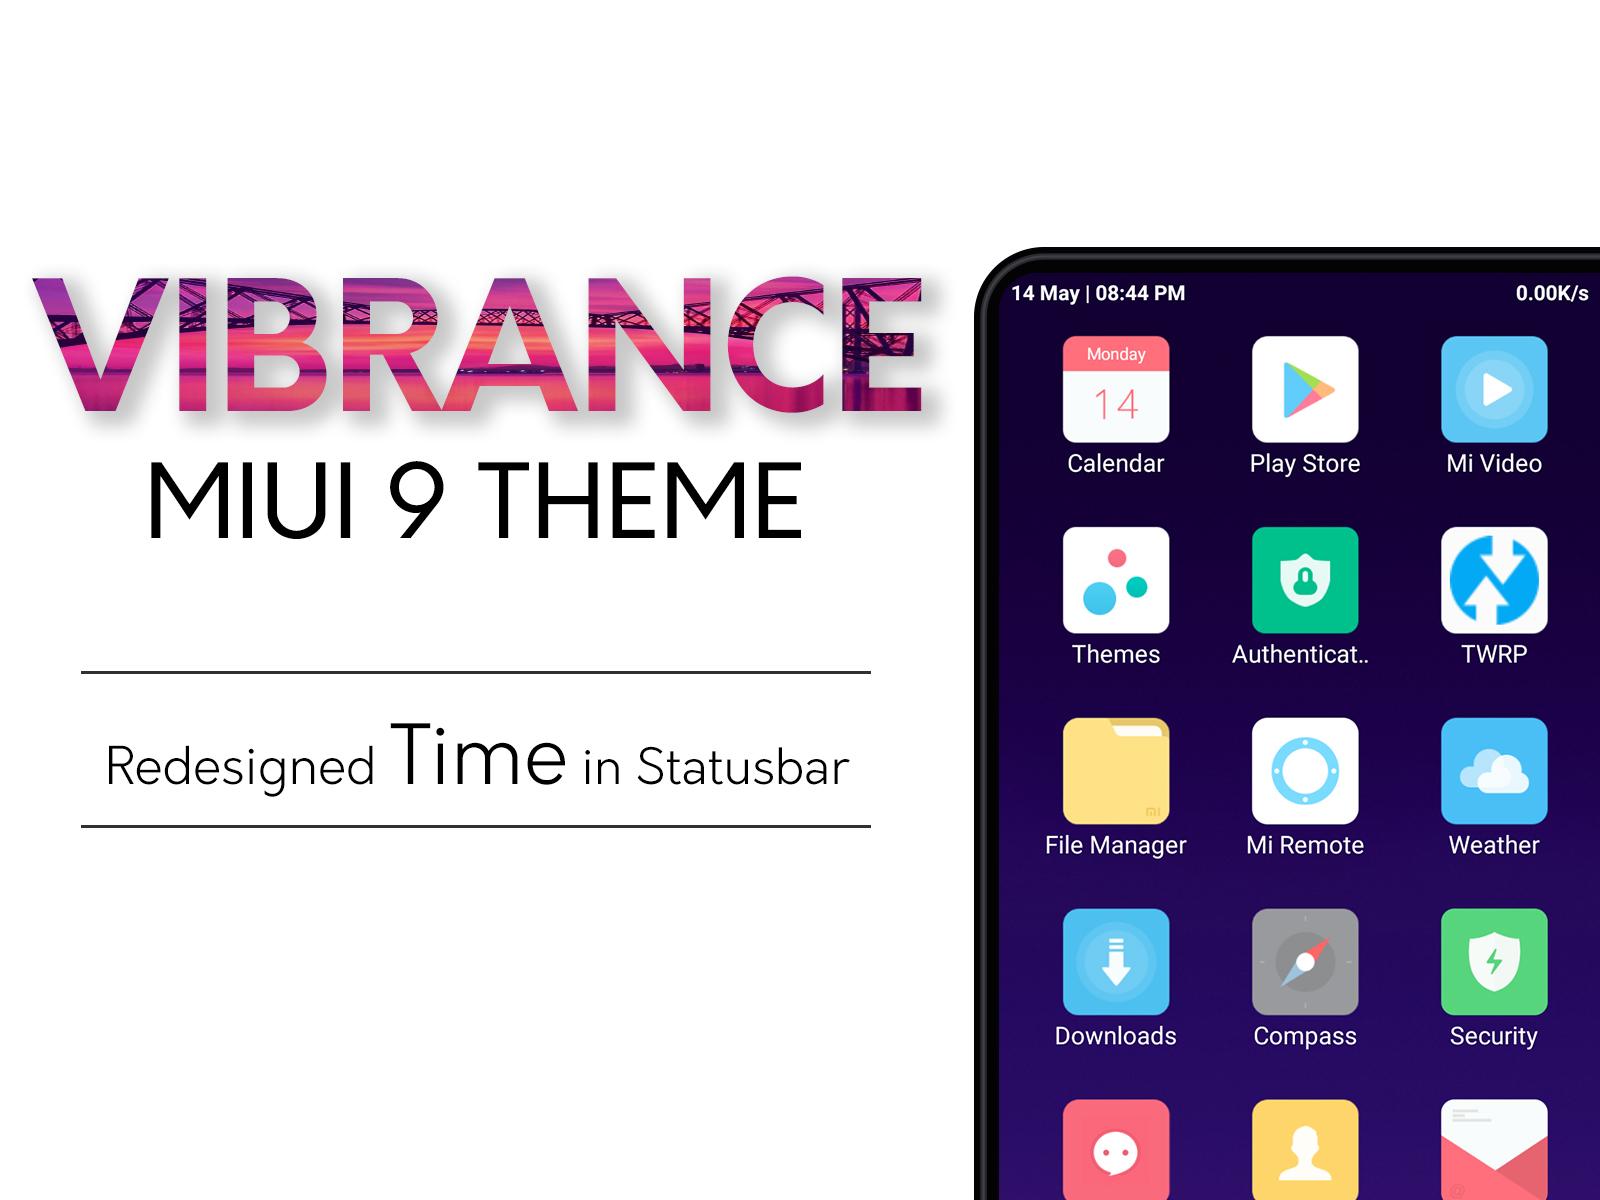 Vibrance MIUI Theme | MI Themex | MIUI Themes, Redmi Themes